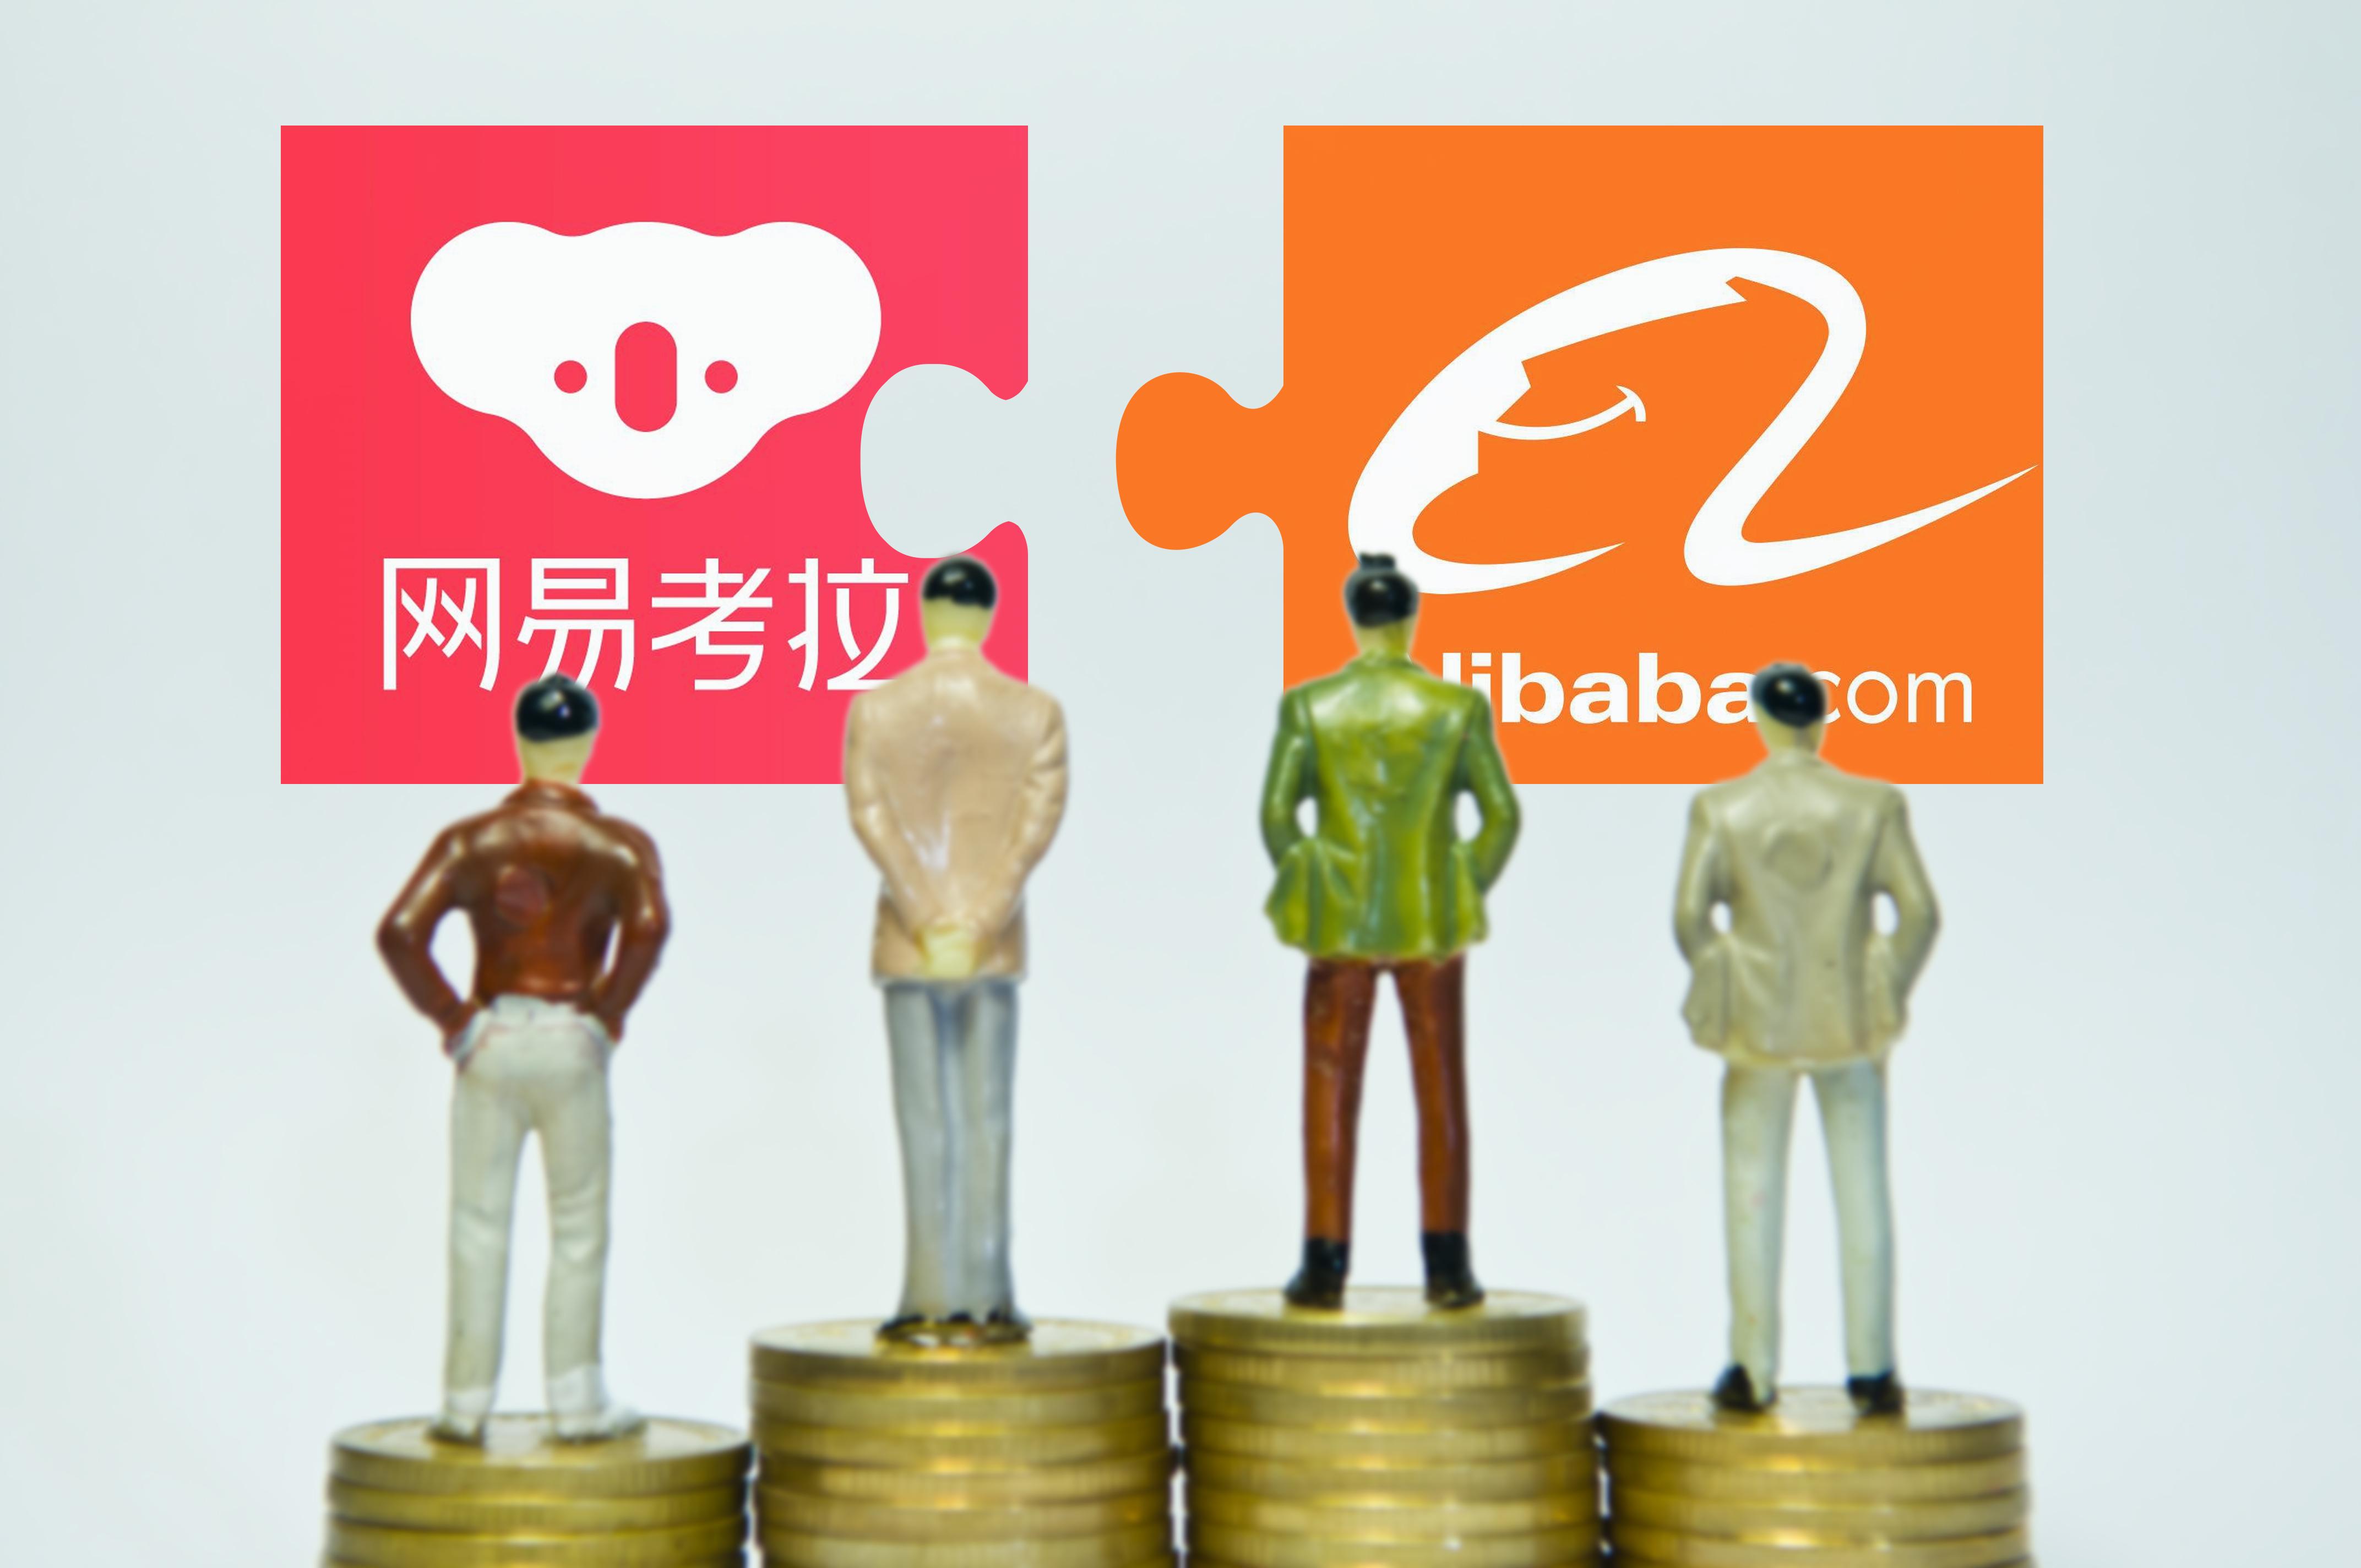 Alibaba acquires import platform Kaola - SHINE News